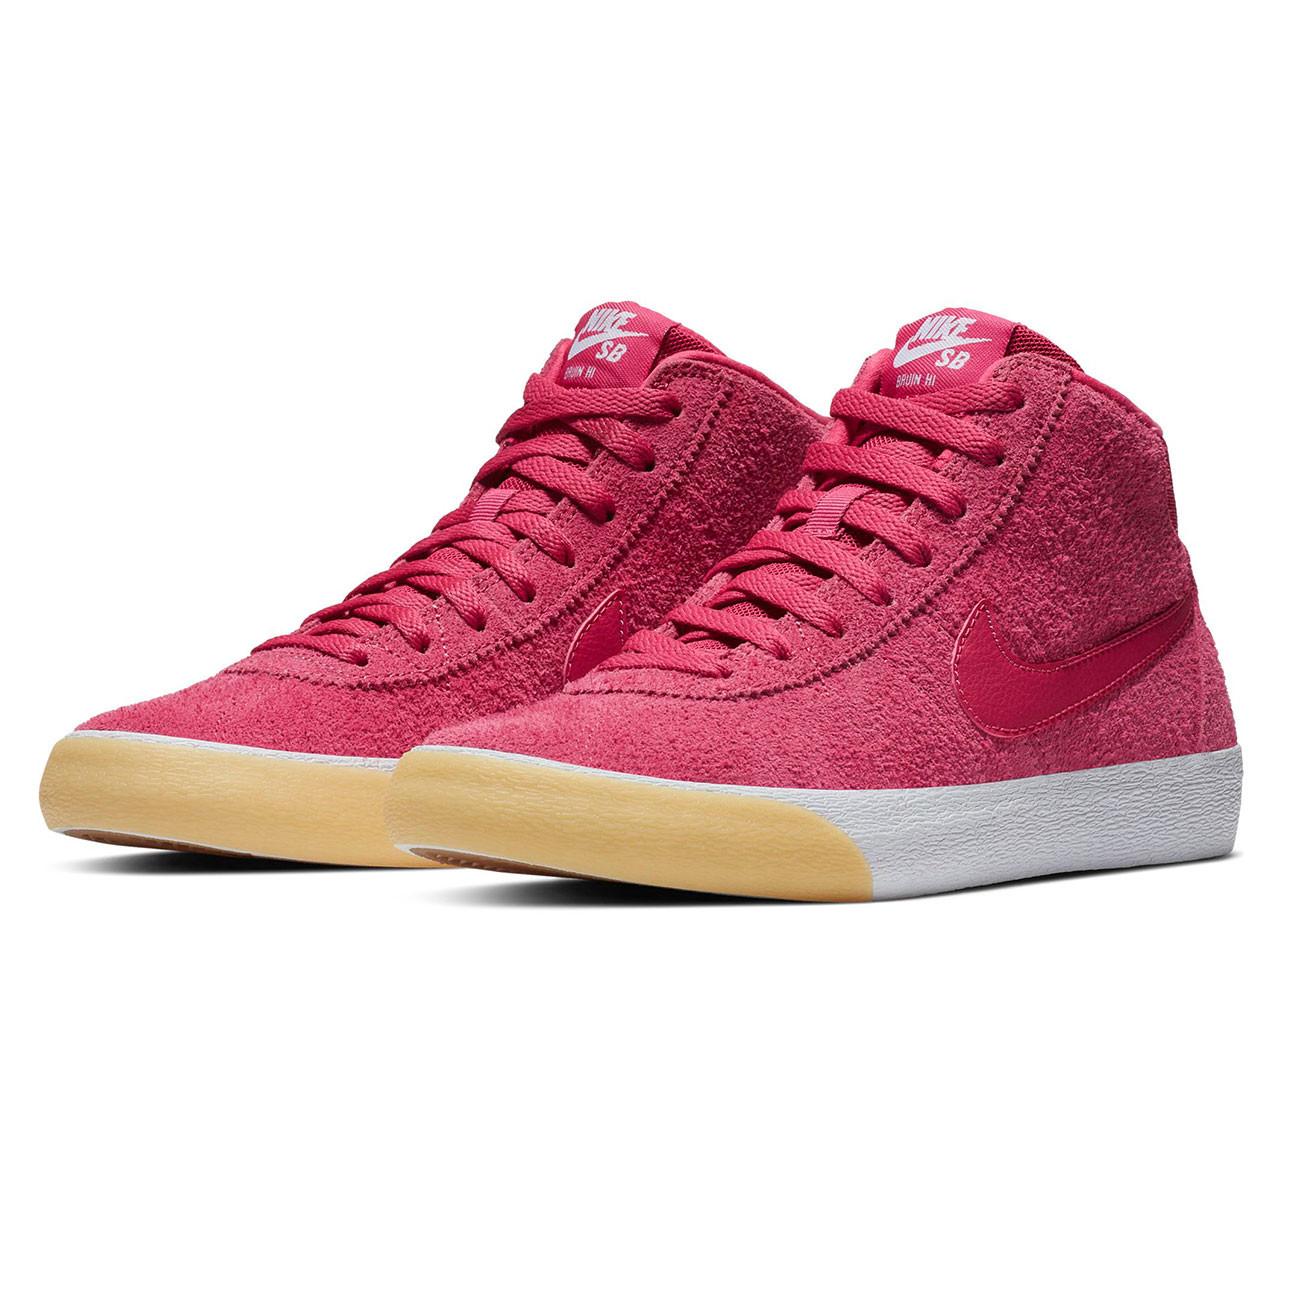 identificación República extinción  Sneakers Nike SB Bruin Hi rush pink/rush pink-gum yellow-w | Snowboard  Zezula